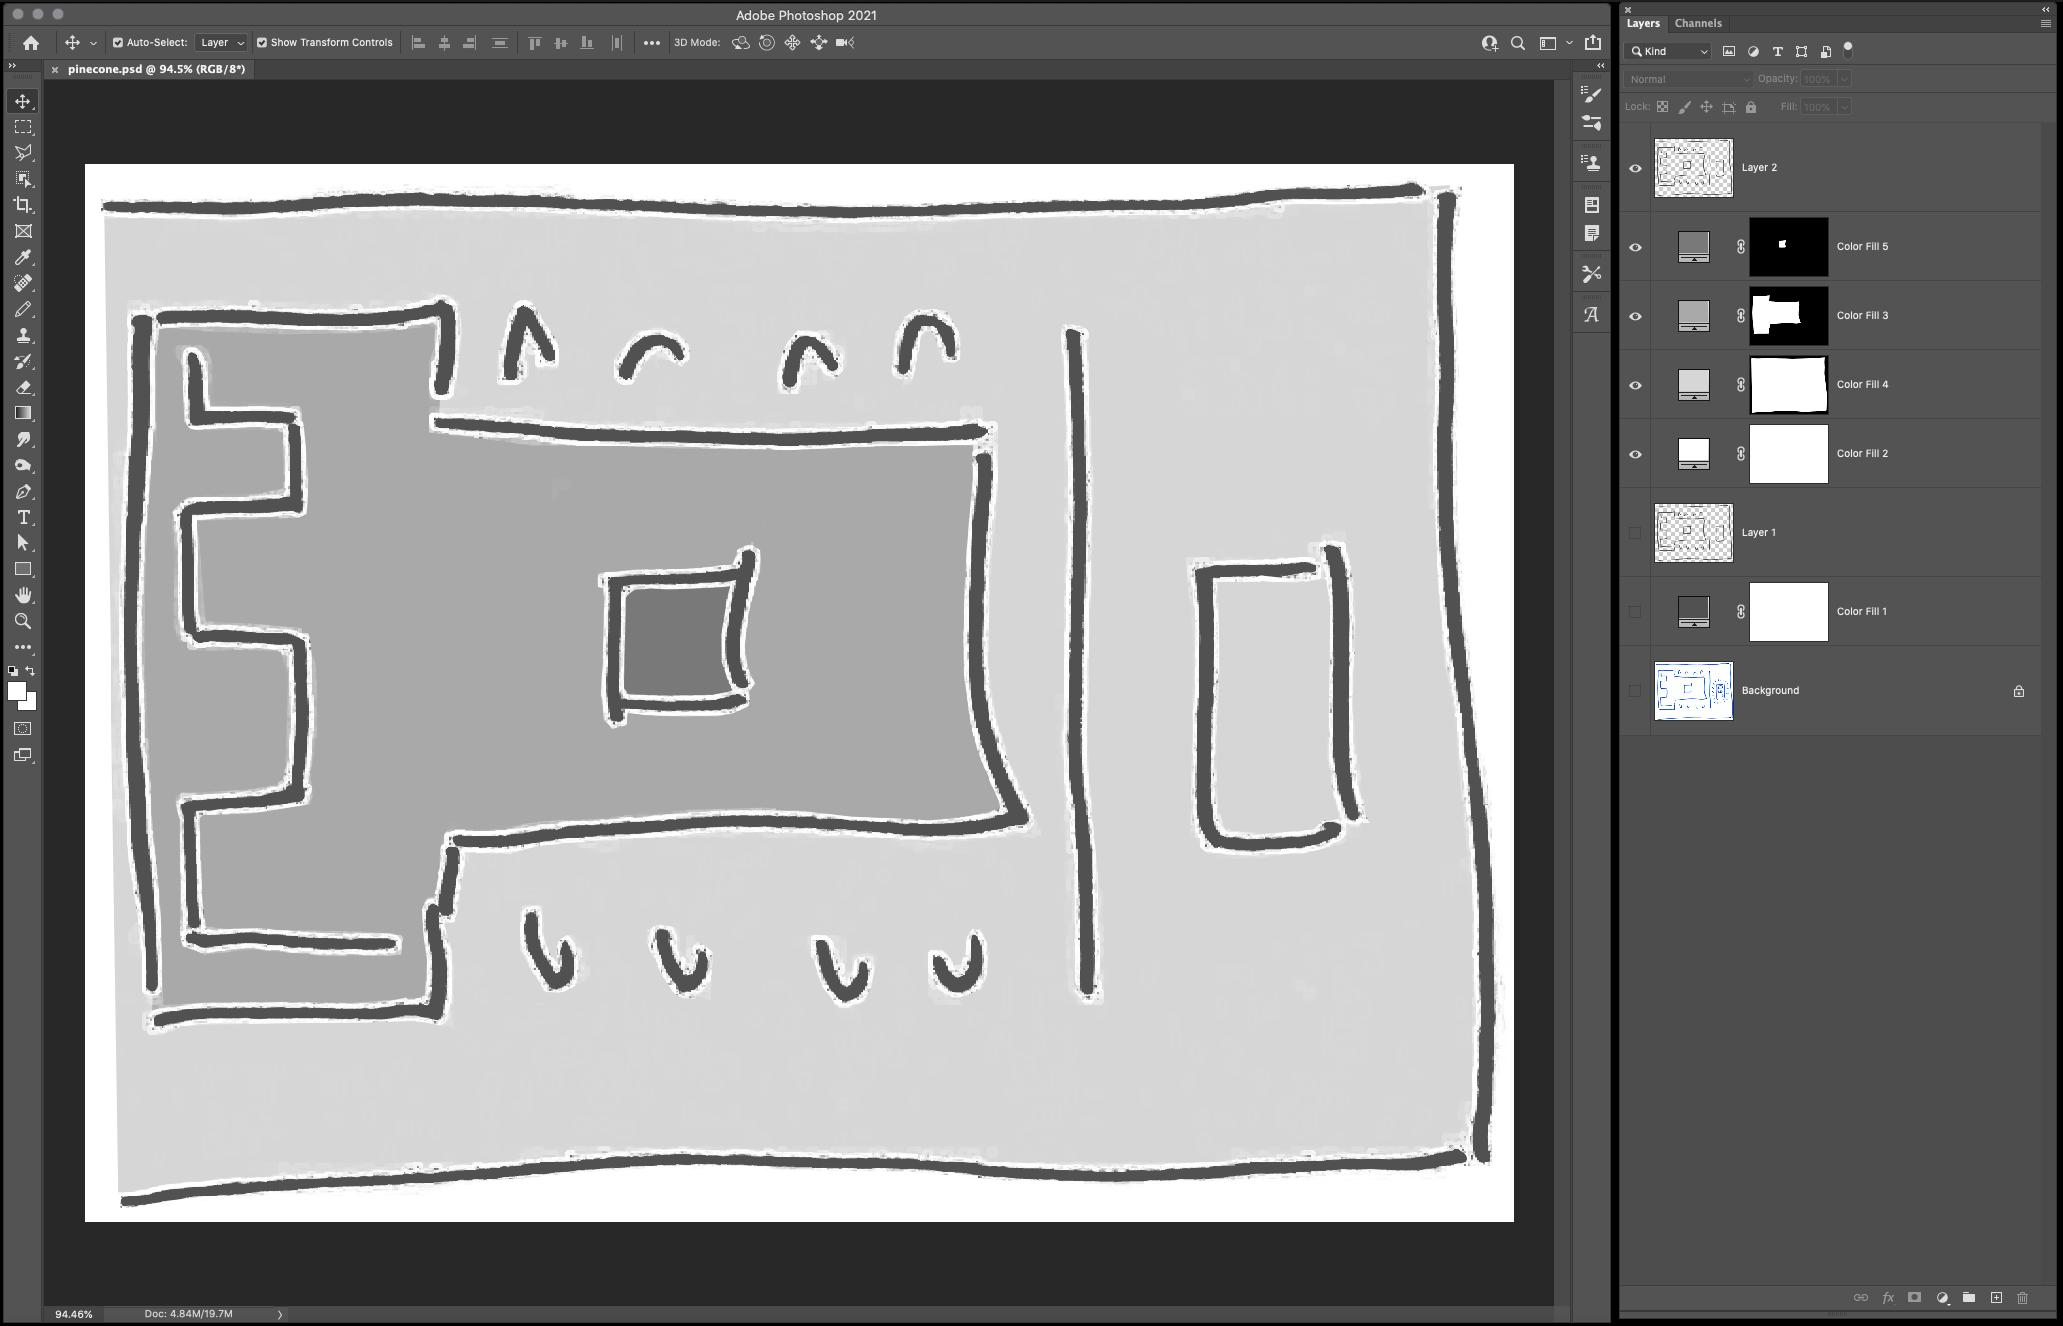 Creating the BL602 simulator image